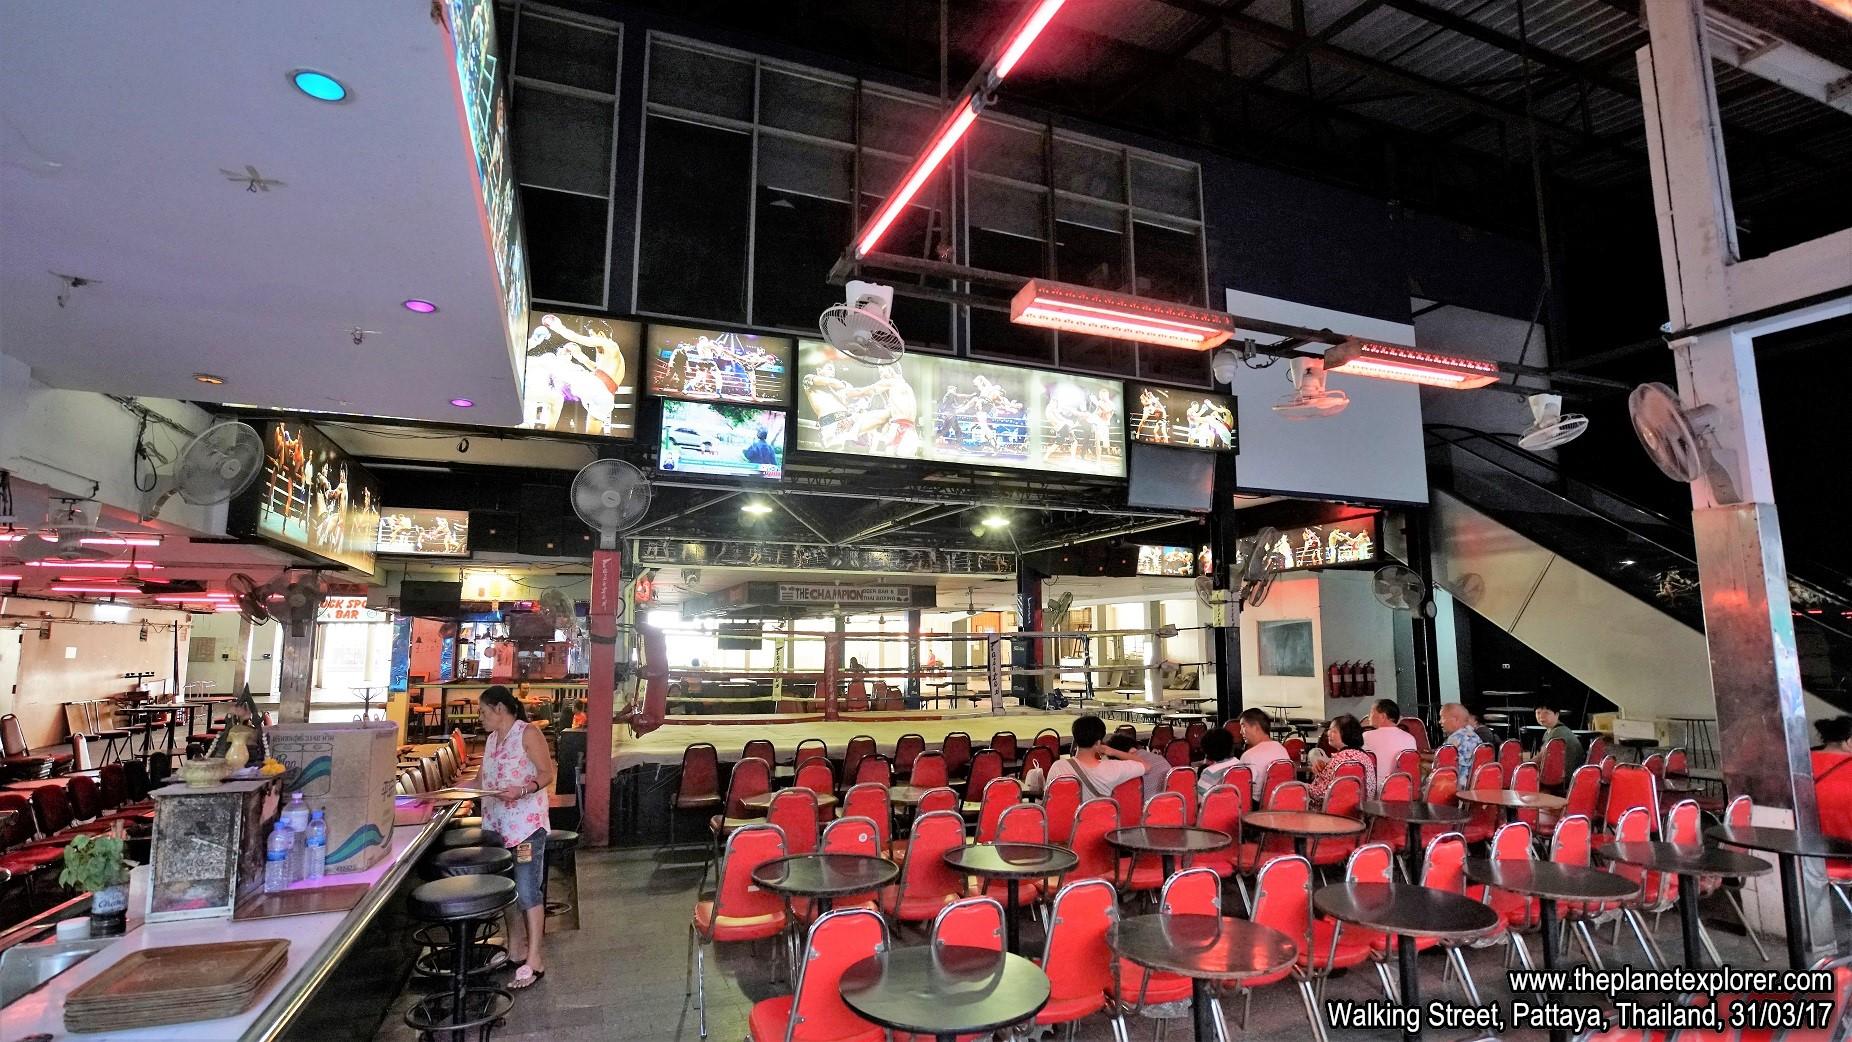 2017-03-31_1754_Thailand_Pattaya_Walking Street_DSC03994_s7R2_LR_@